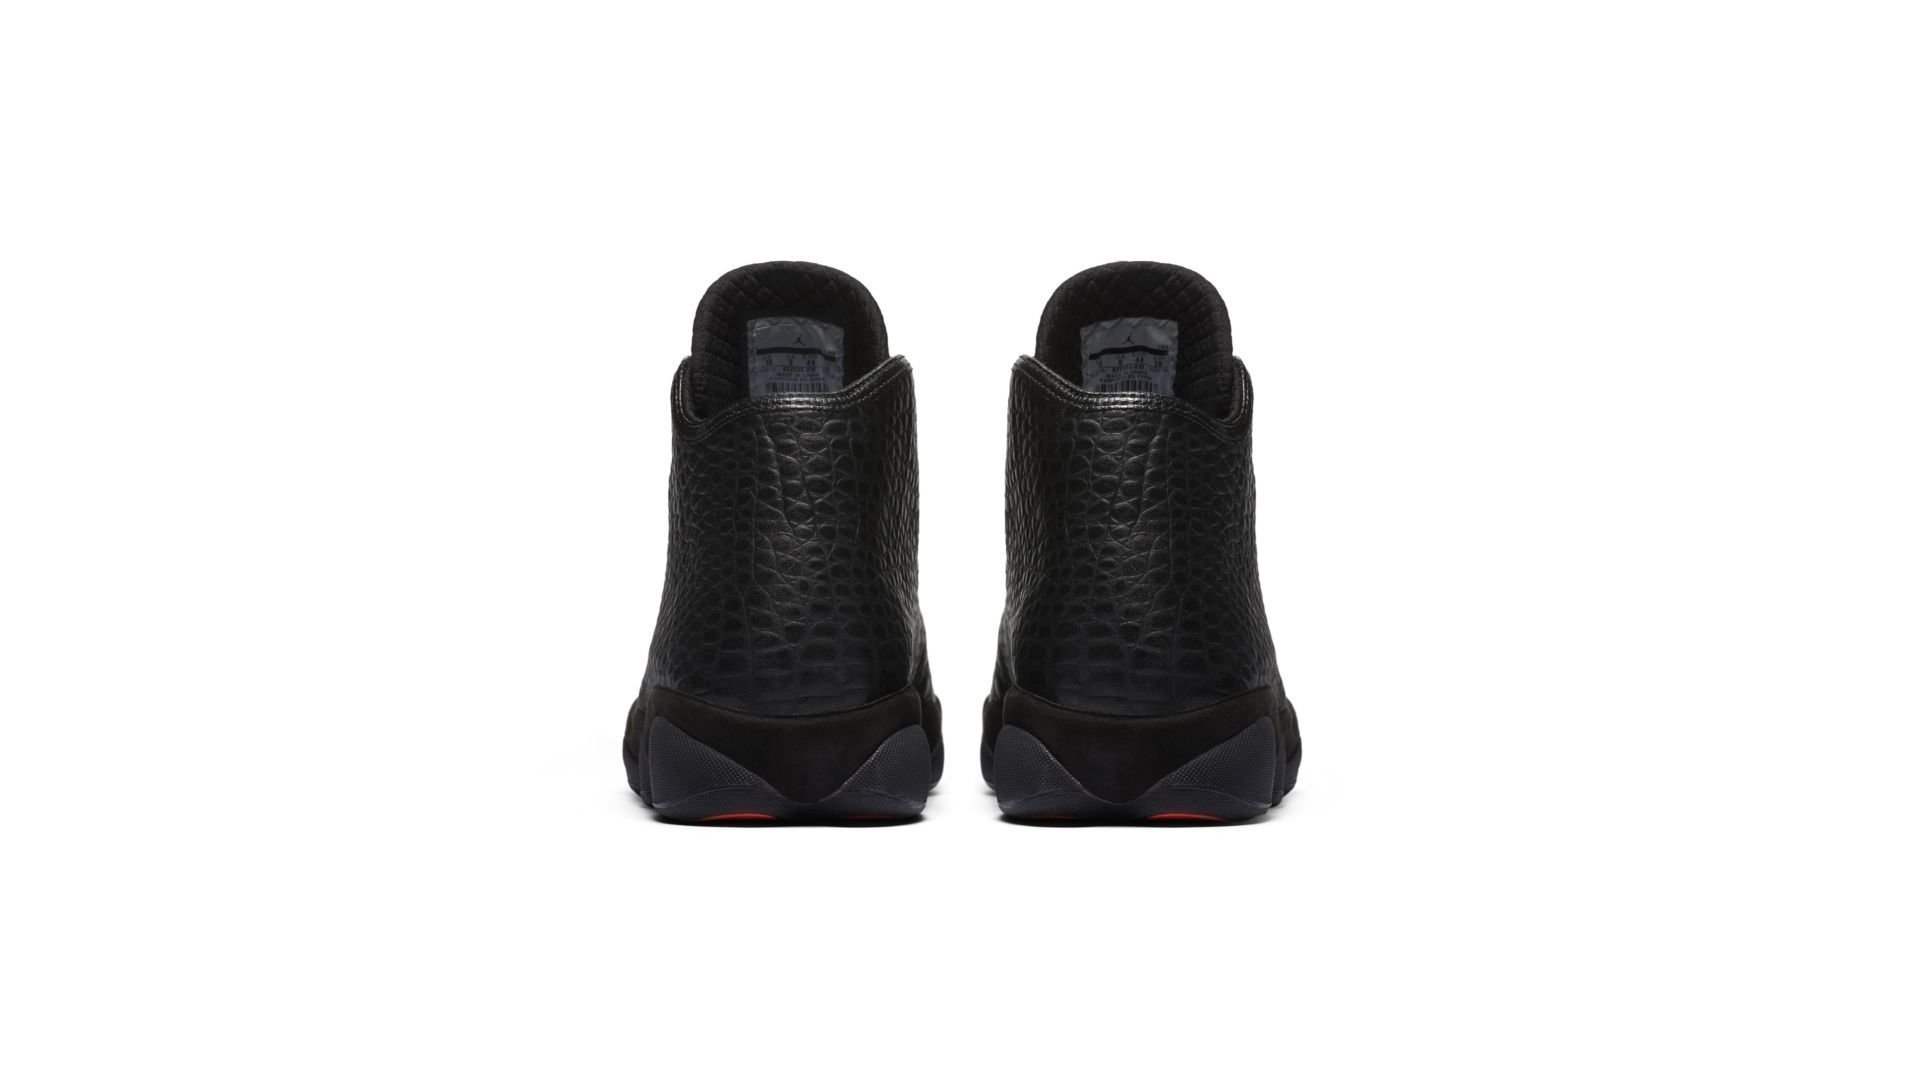 Jordan Horizon Black Croc (822333-010)